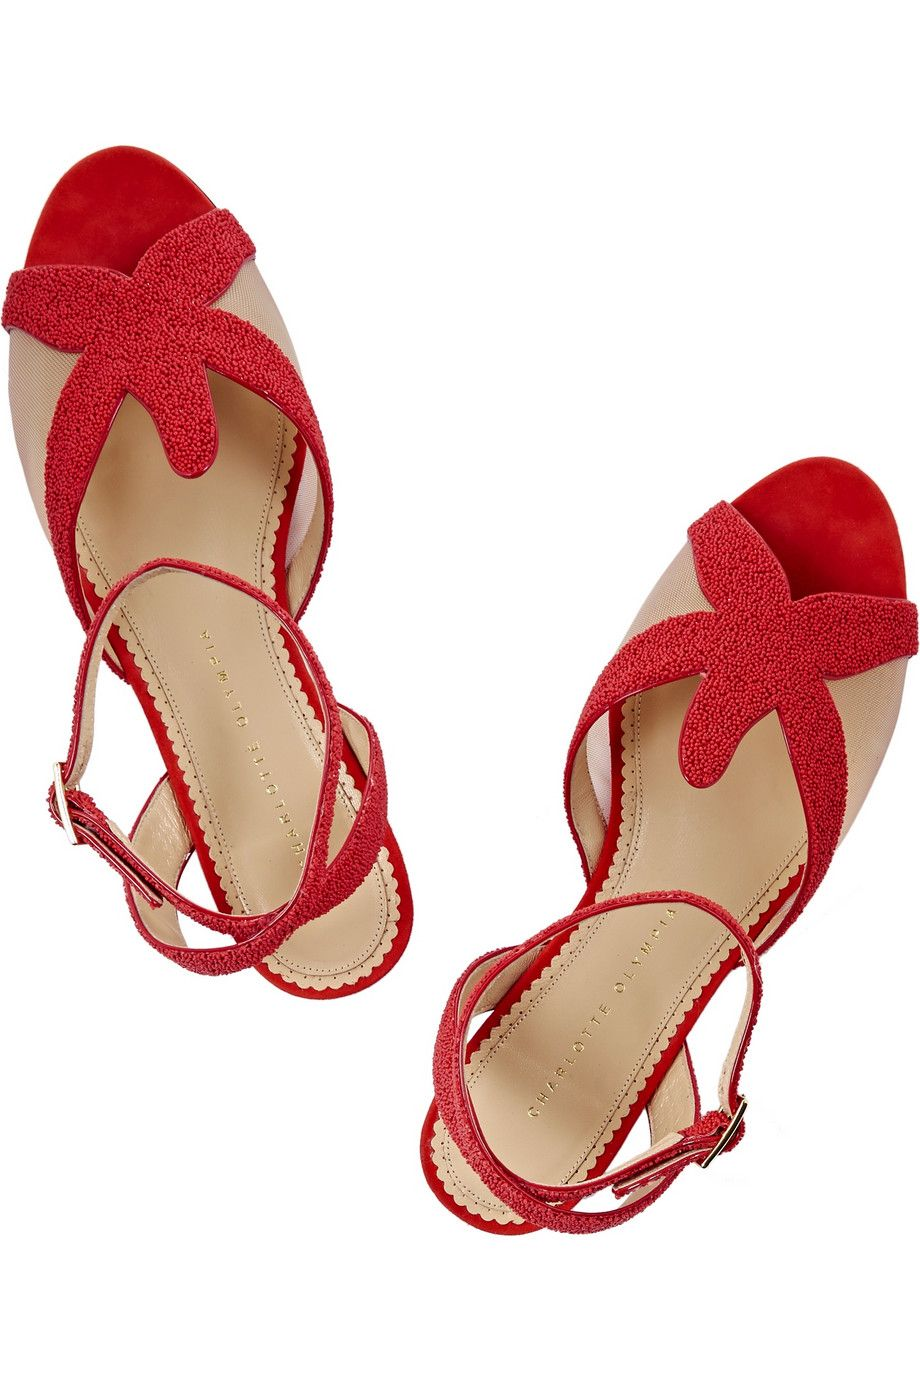 Charlotte OlympiaSandy beaded leather sandalsclose up